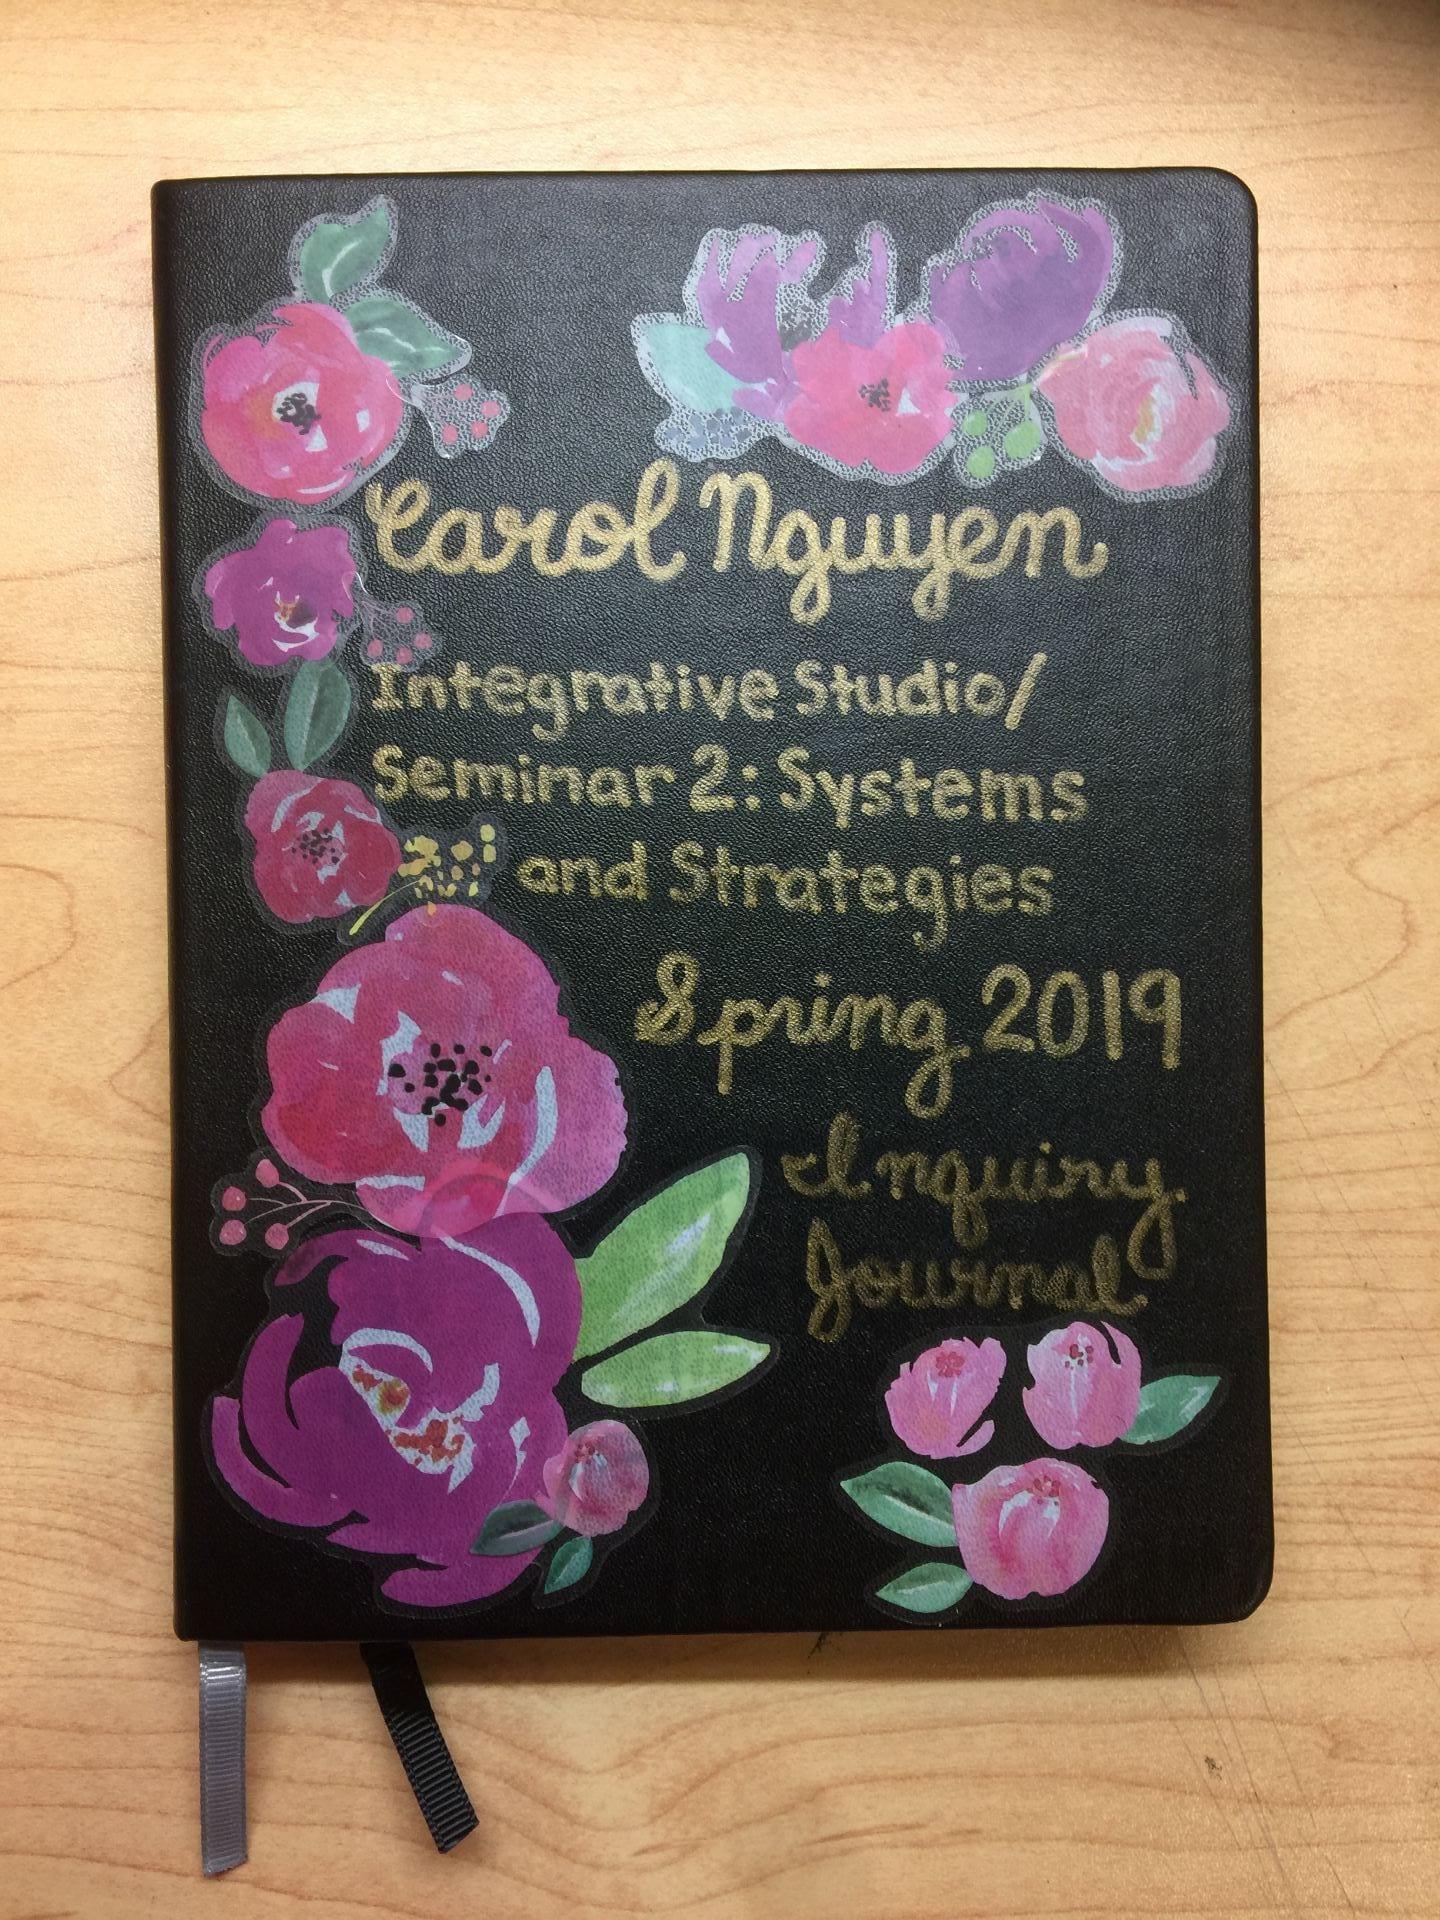 Integrative Studio/Seminar 2 Journal